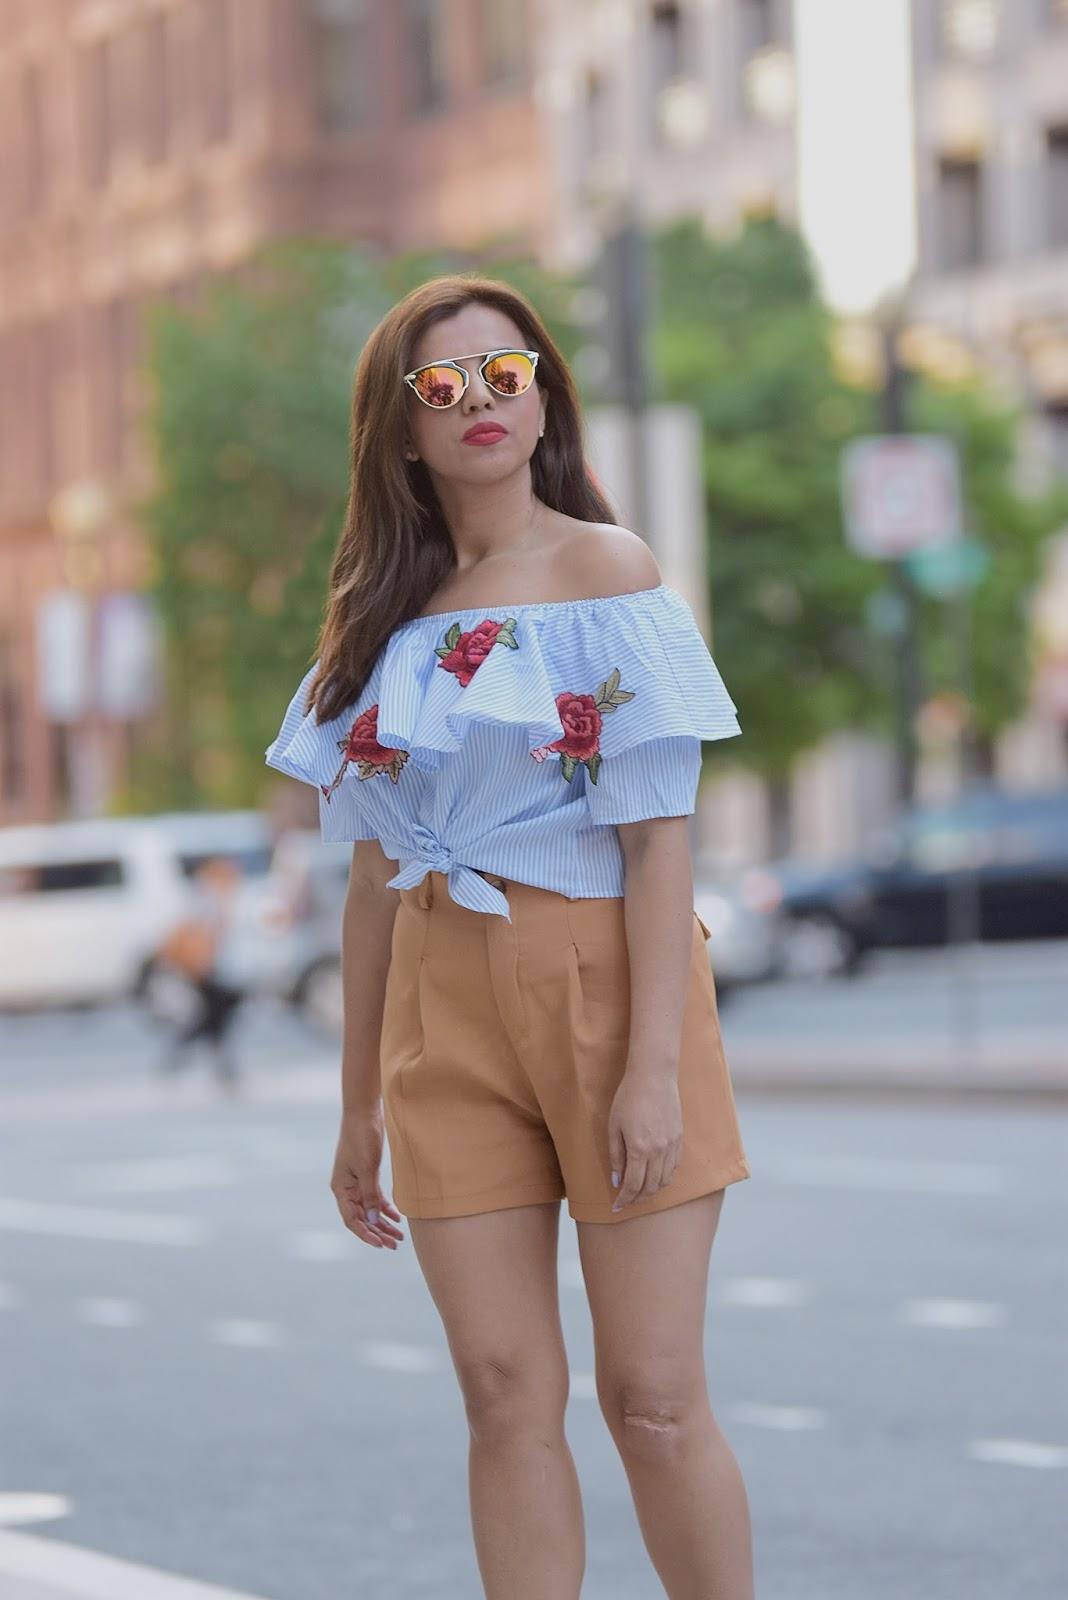 Stripes and Patches-MariEstilo-look of the day- camisa de rayas bordada-shein-fashionblogger-streetstyle-washingtondc-nyblogger-tendencia bordados